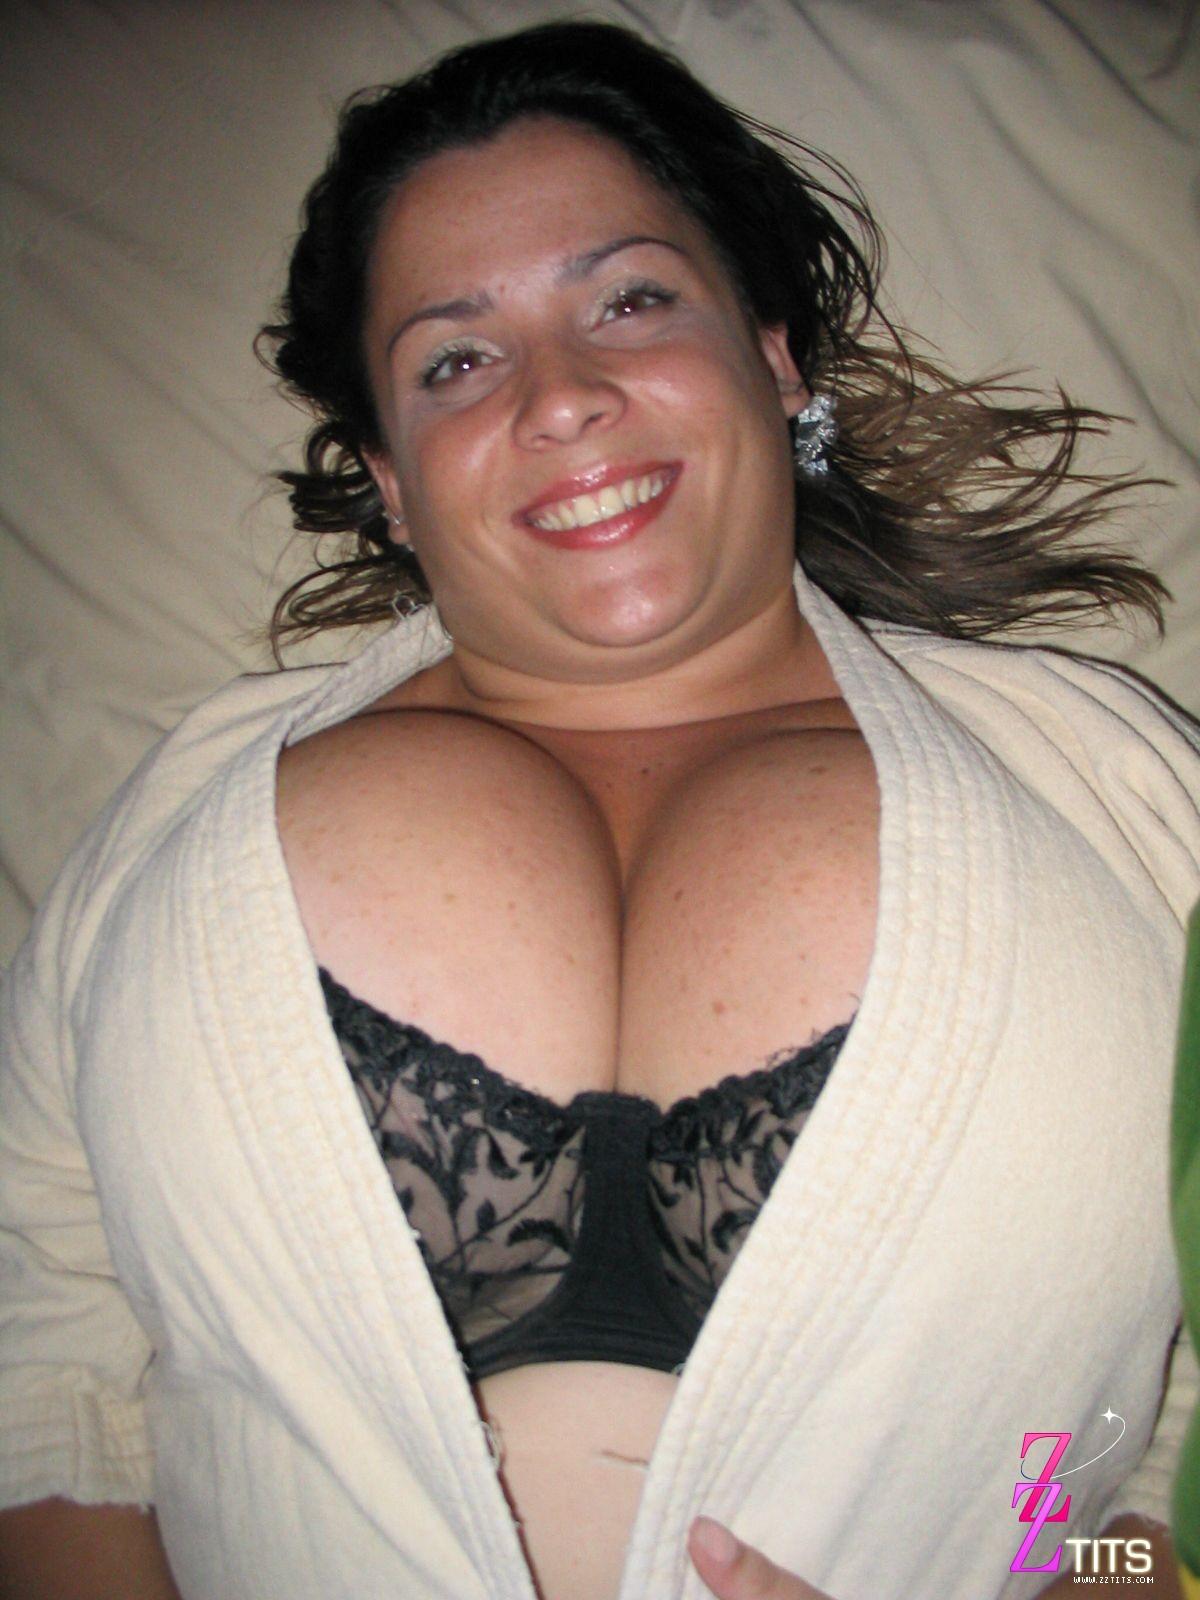 Karla Senna Monster Big Tits